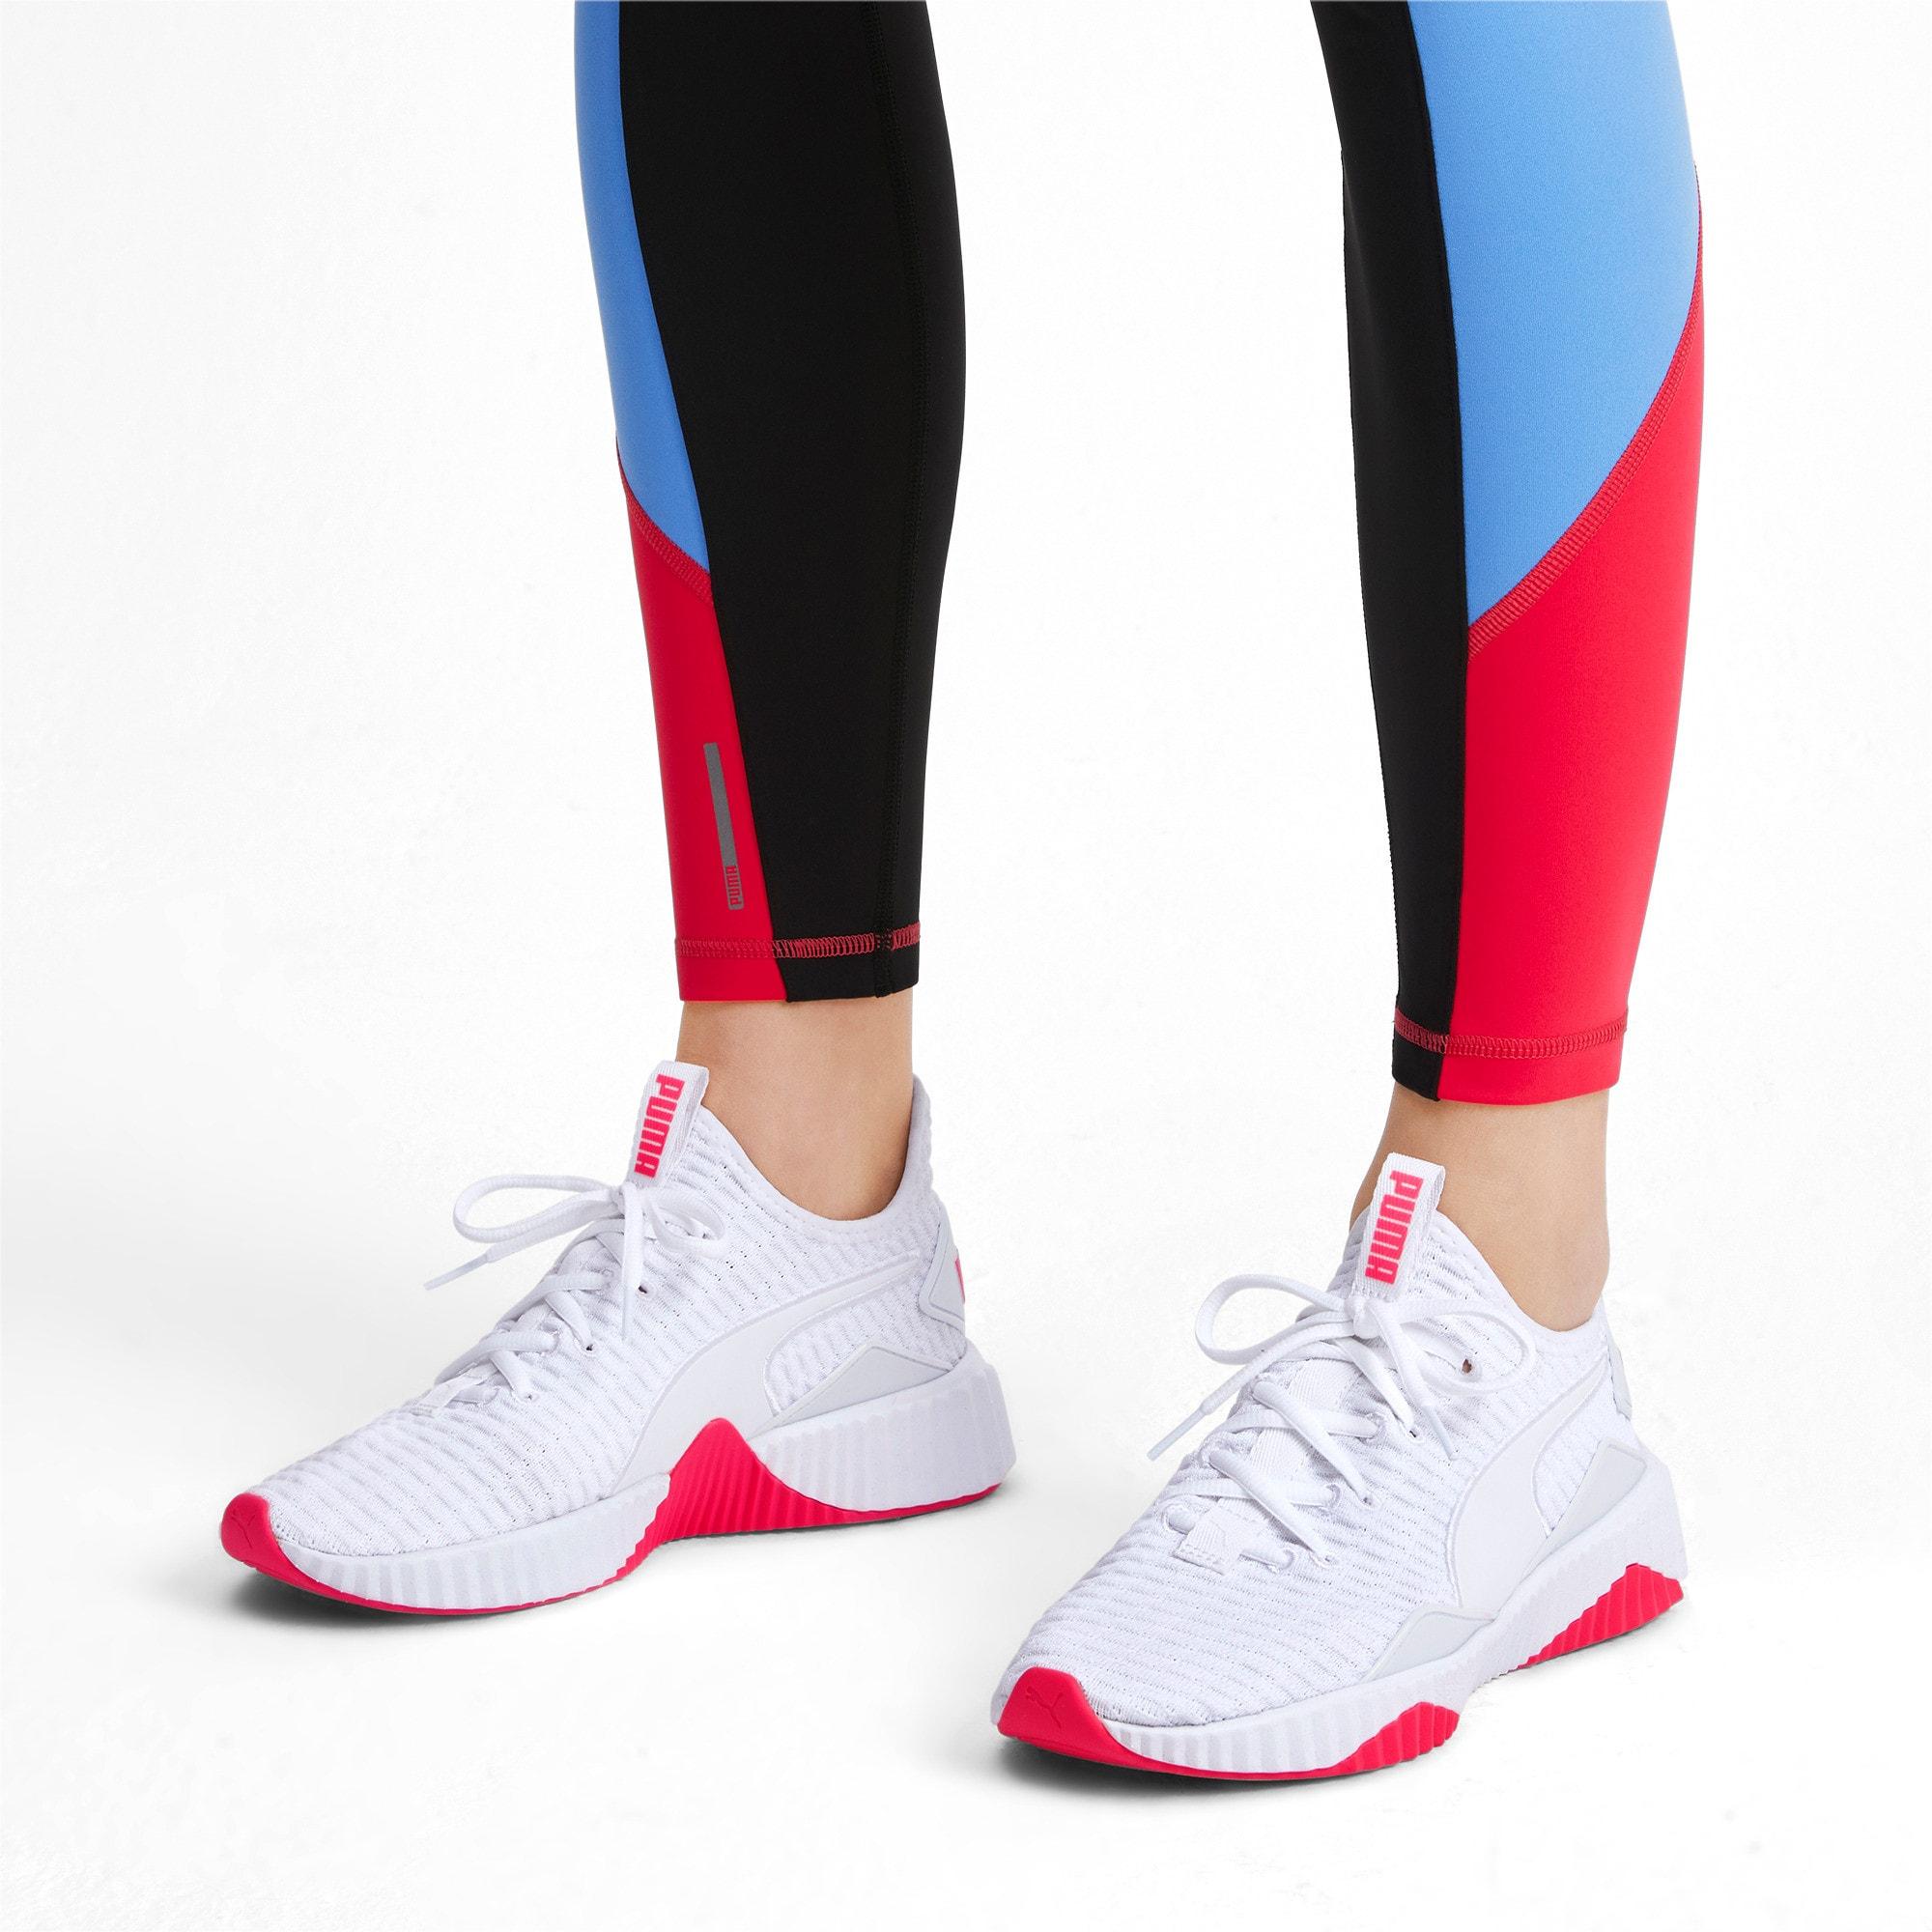 Thumbnail 2 of Defy Damen Sneaker, Puma White-Pink Alert, medium